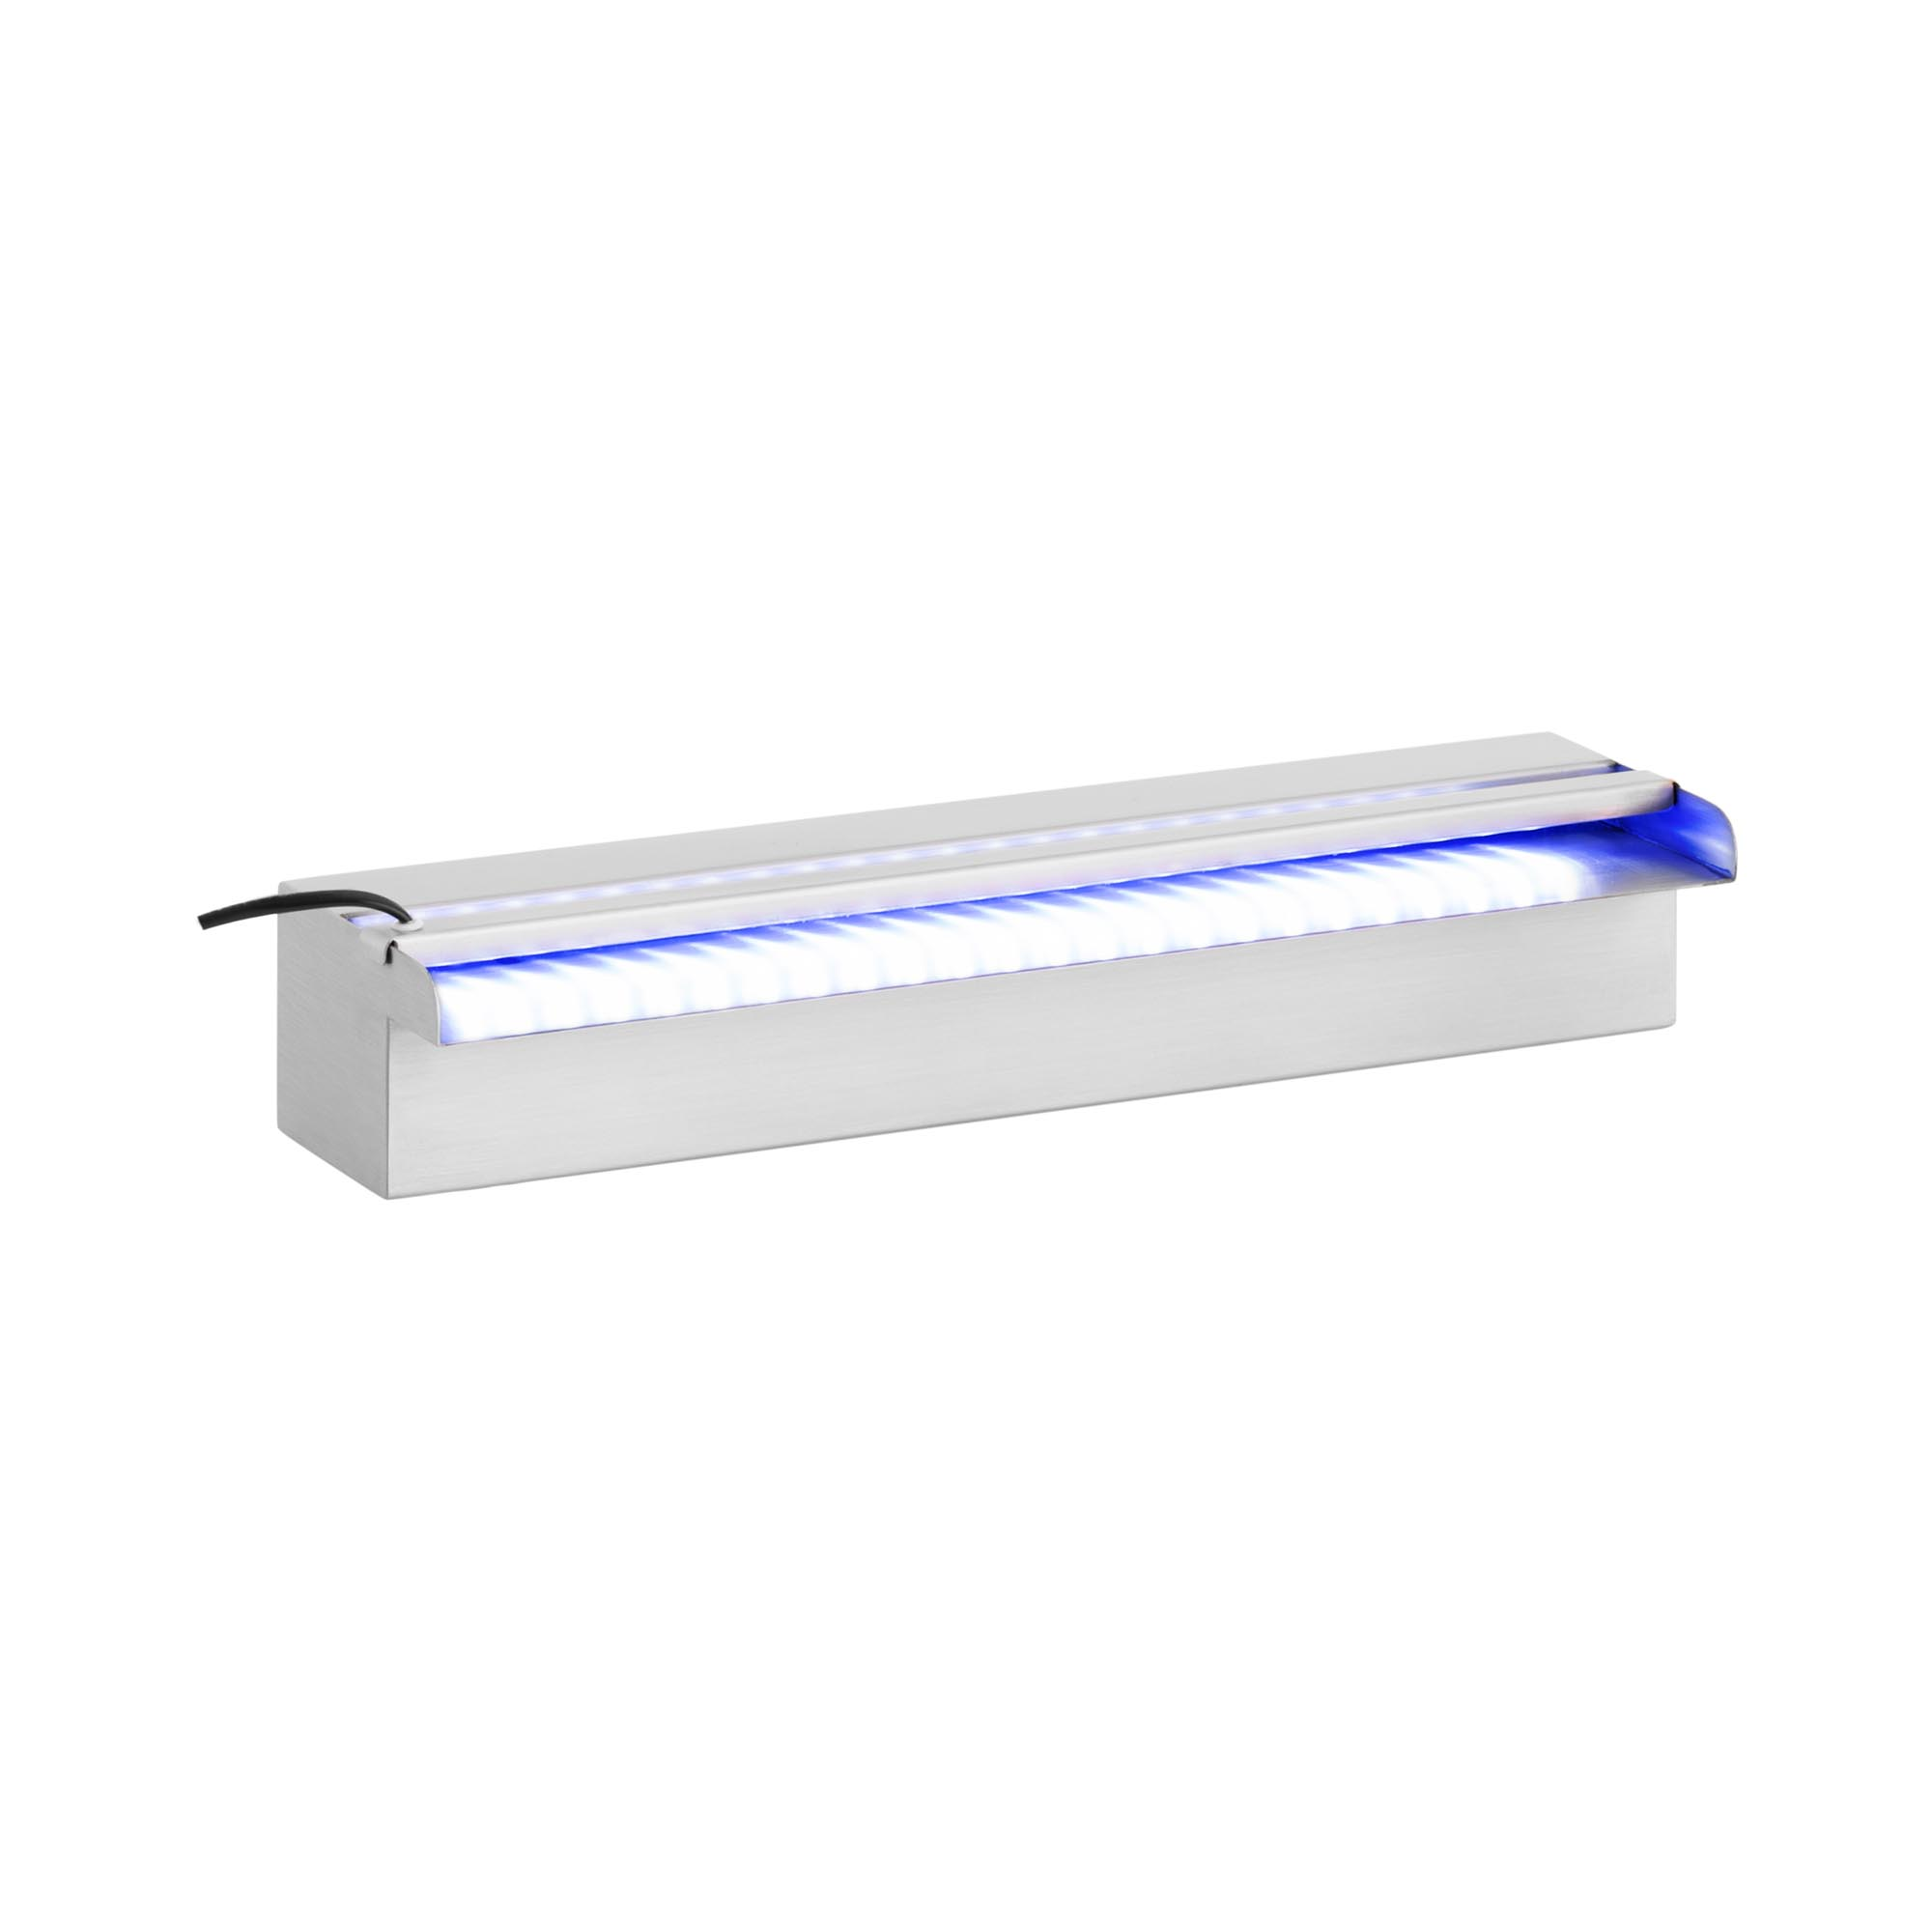 Uniprodo Schwalldusche Pool - 45 cm - LED-Beleuchtung 10250298